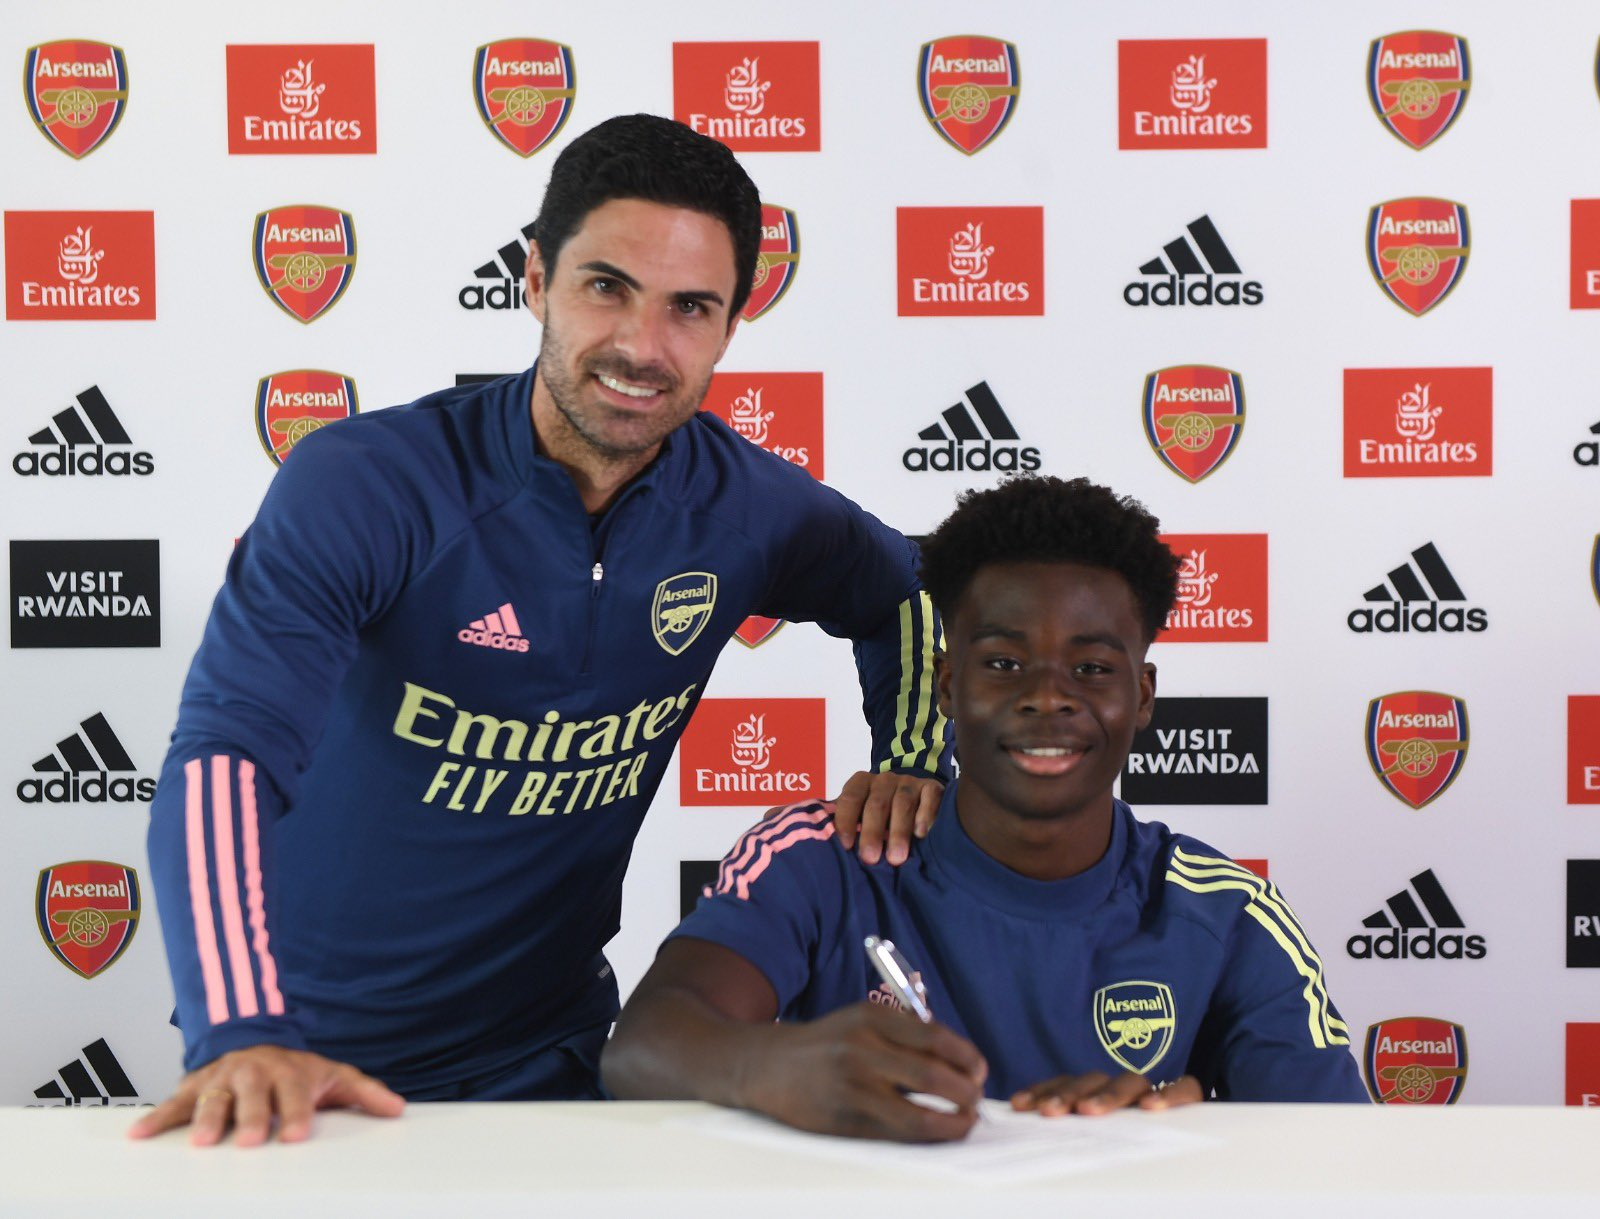 Ferdinand Urges Arteta To Build Arsenal Team Around Saka